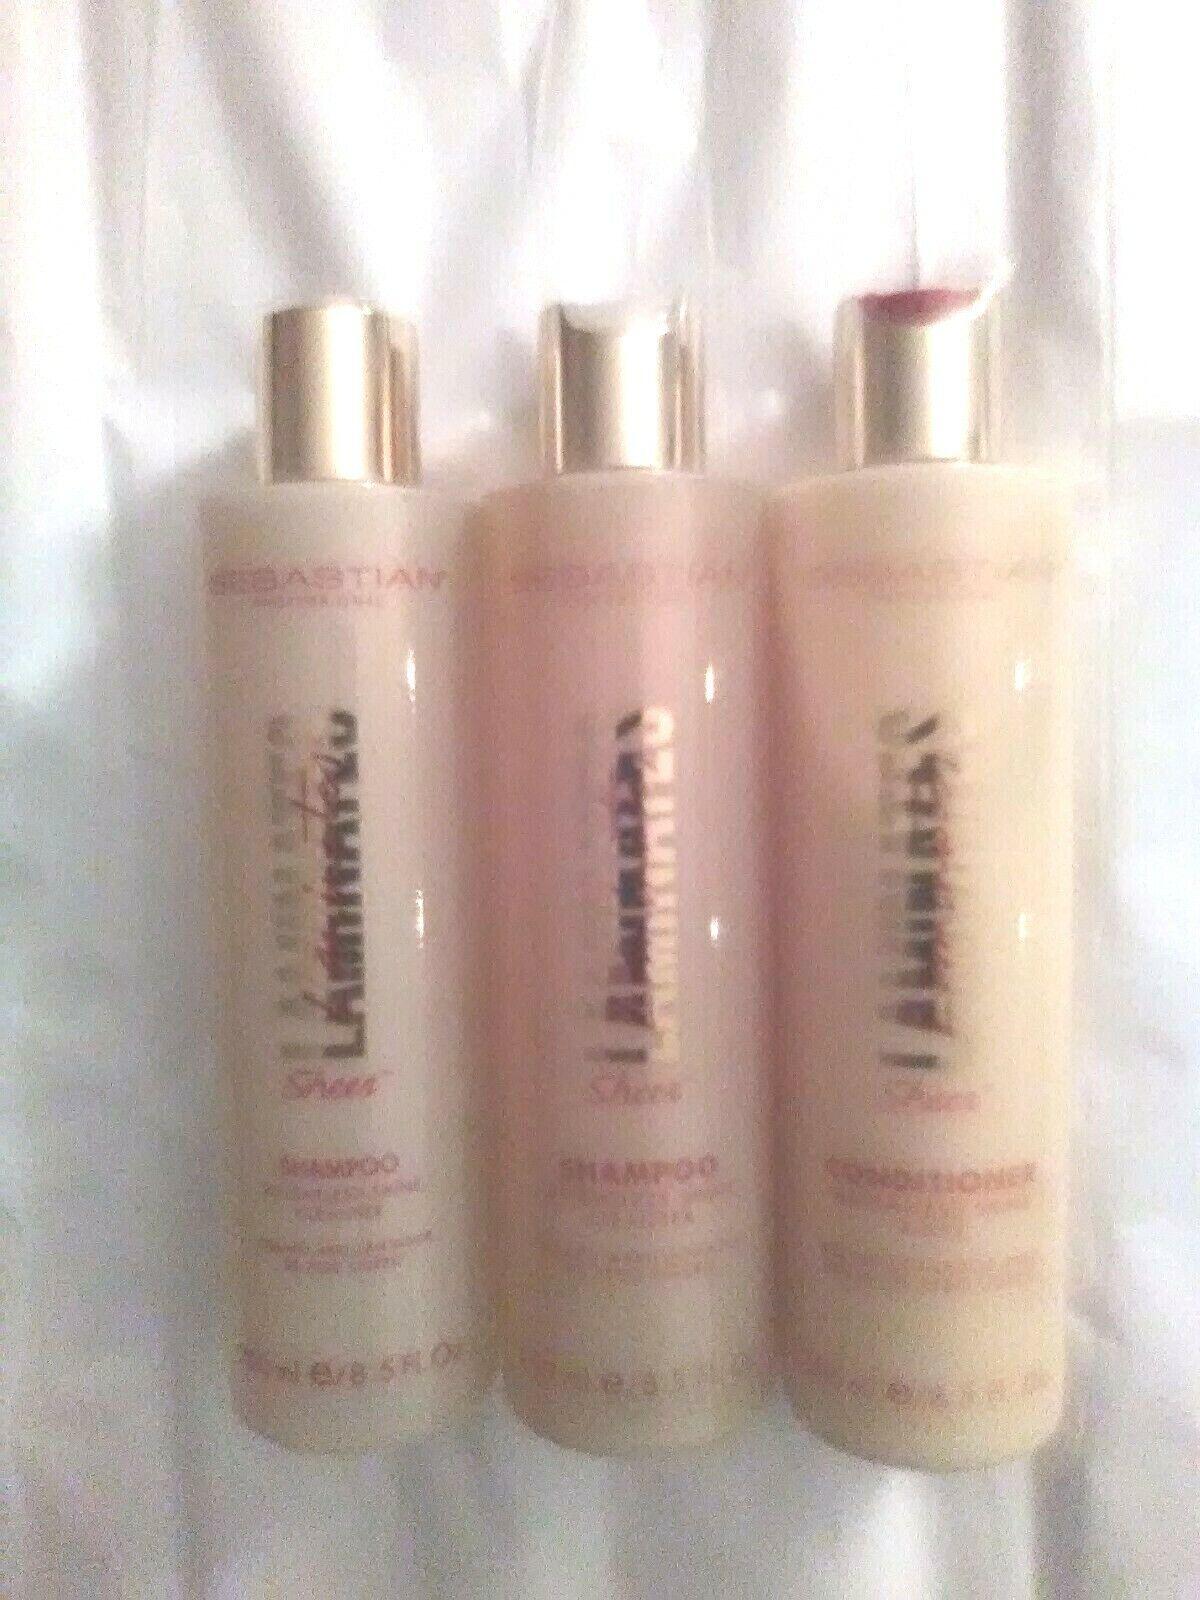 Sebastian Laminates Sheer 2 Shampoo Weightless Shine Cleaner 1 Conditioner Rinse - $75.00